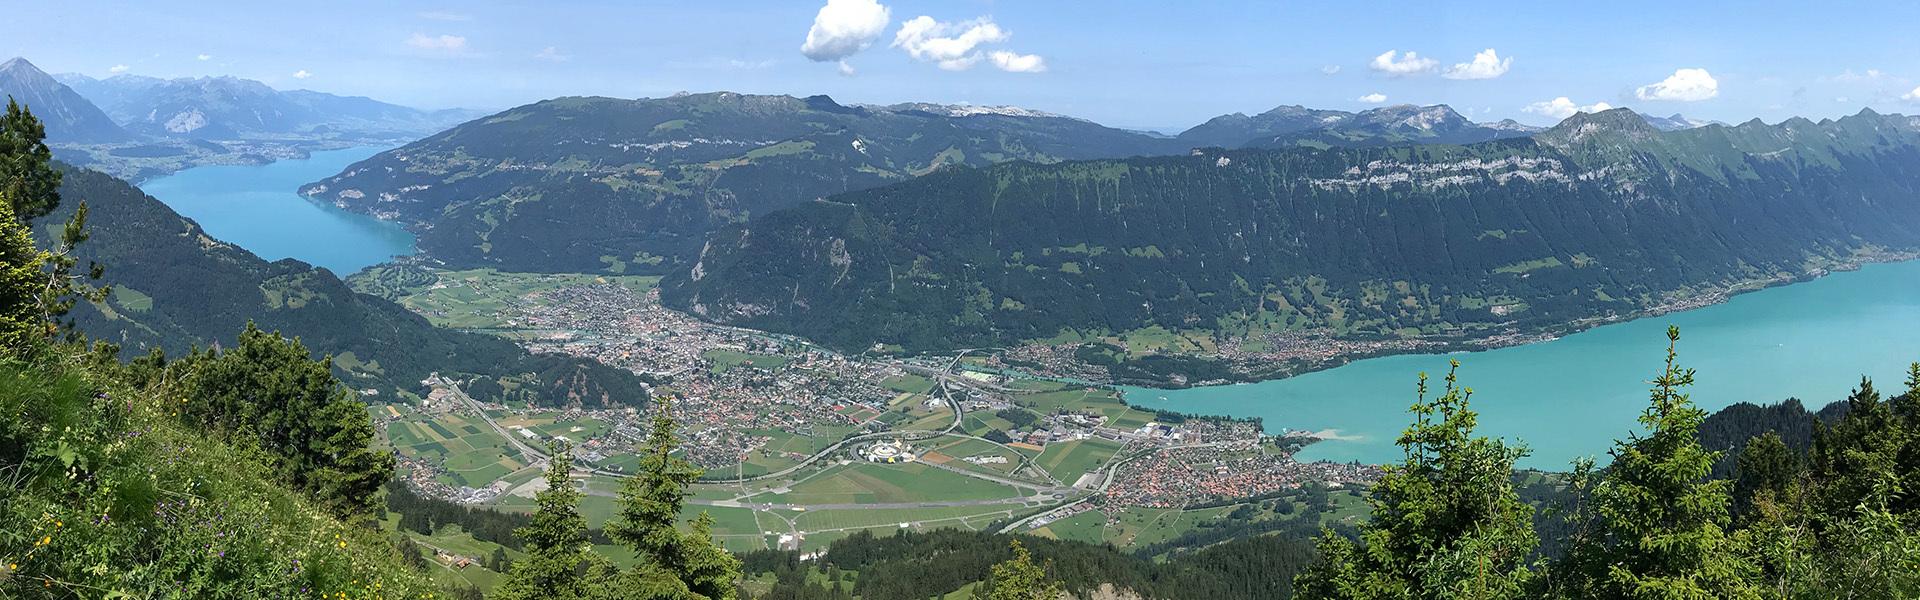 Gründung & Finanzierung - Volkswirtschaft Berner Oberland